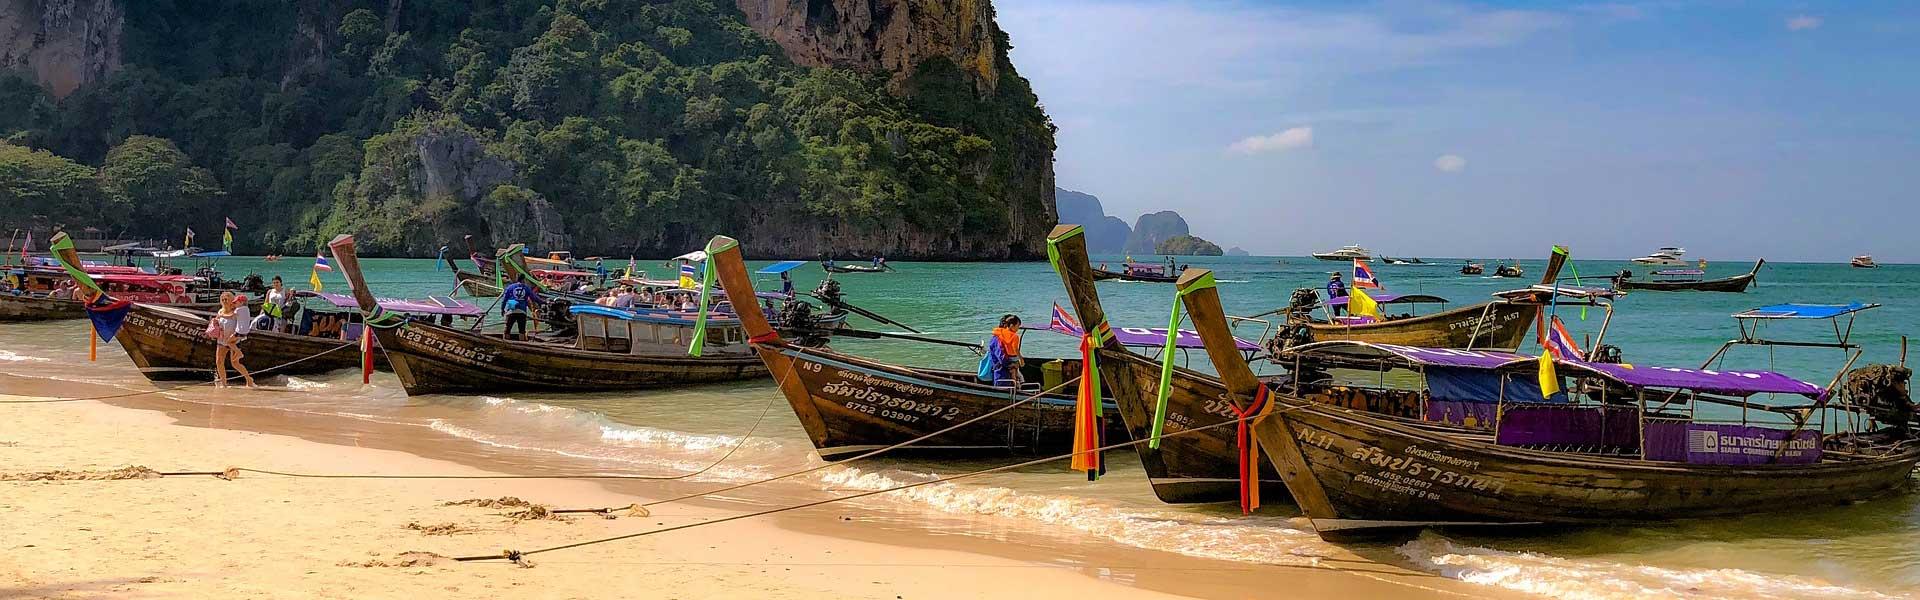 Thailand islands comparison guide